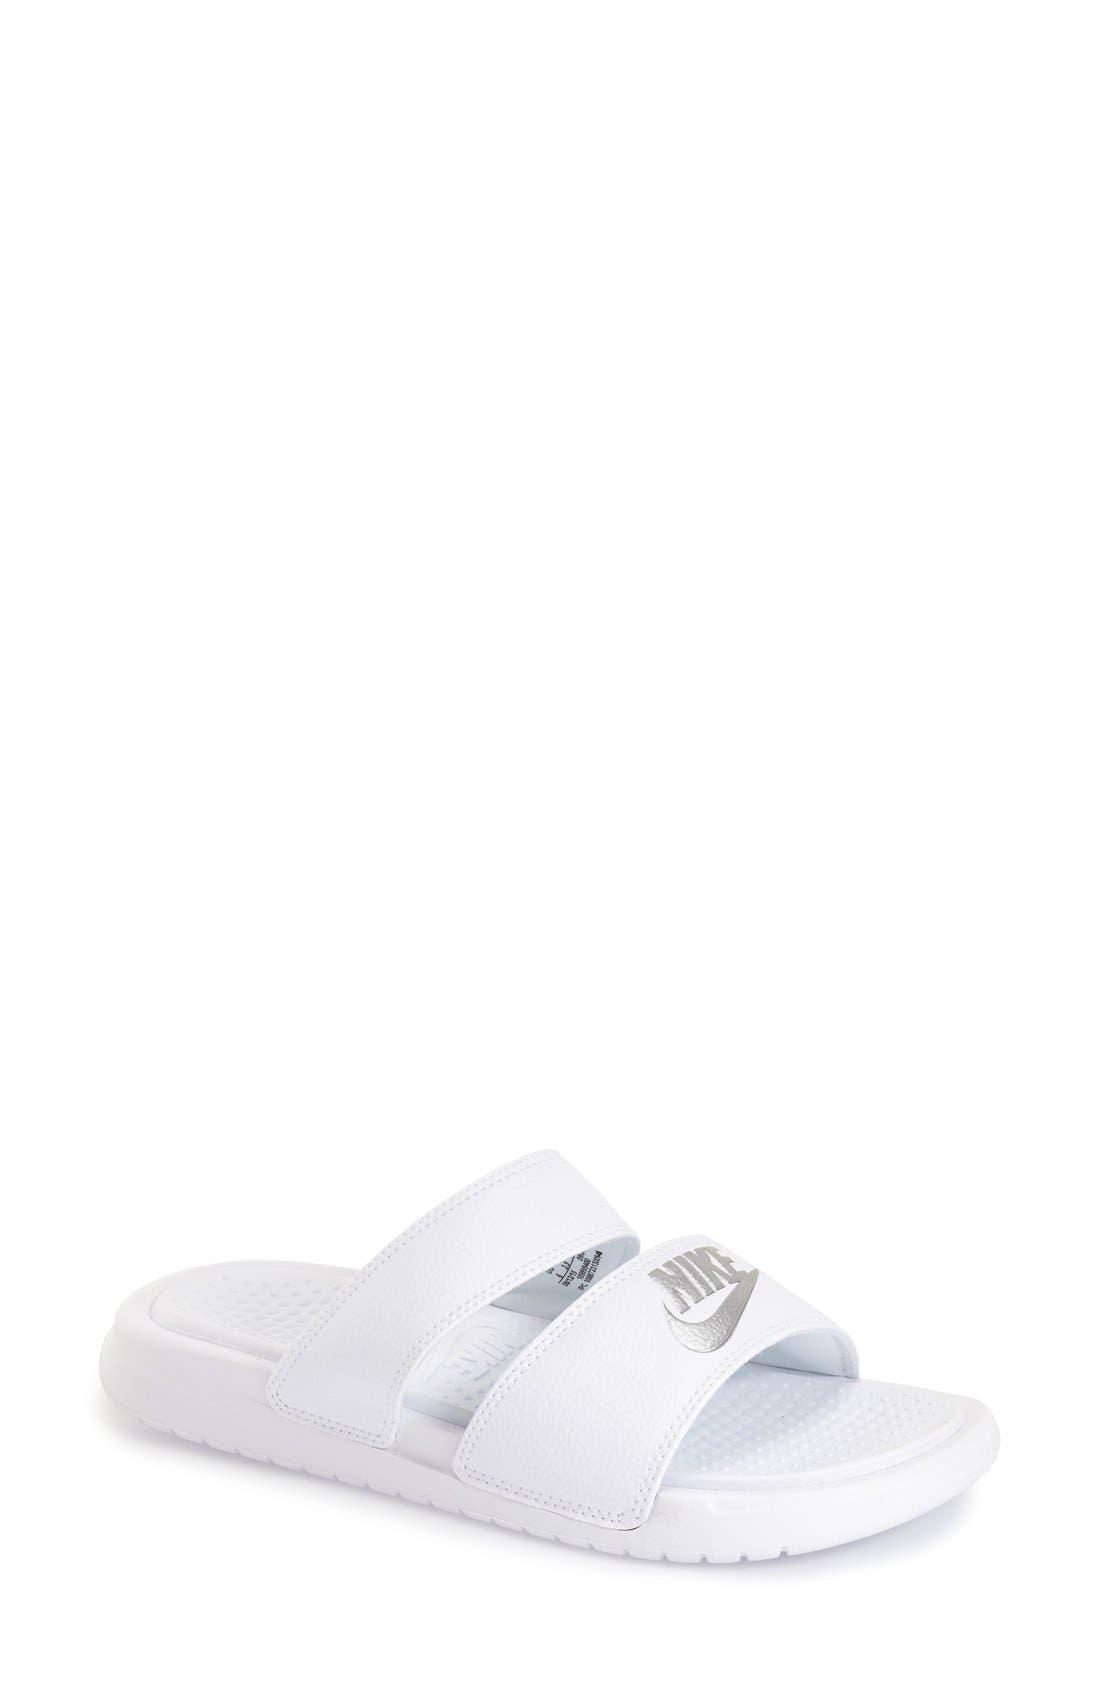 'Benassi - Ultra' Slide Sandal,                         Main,                         color, White/ Metallic Silver